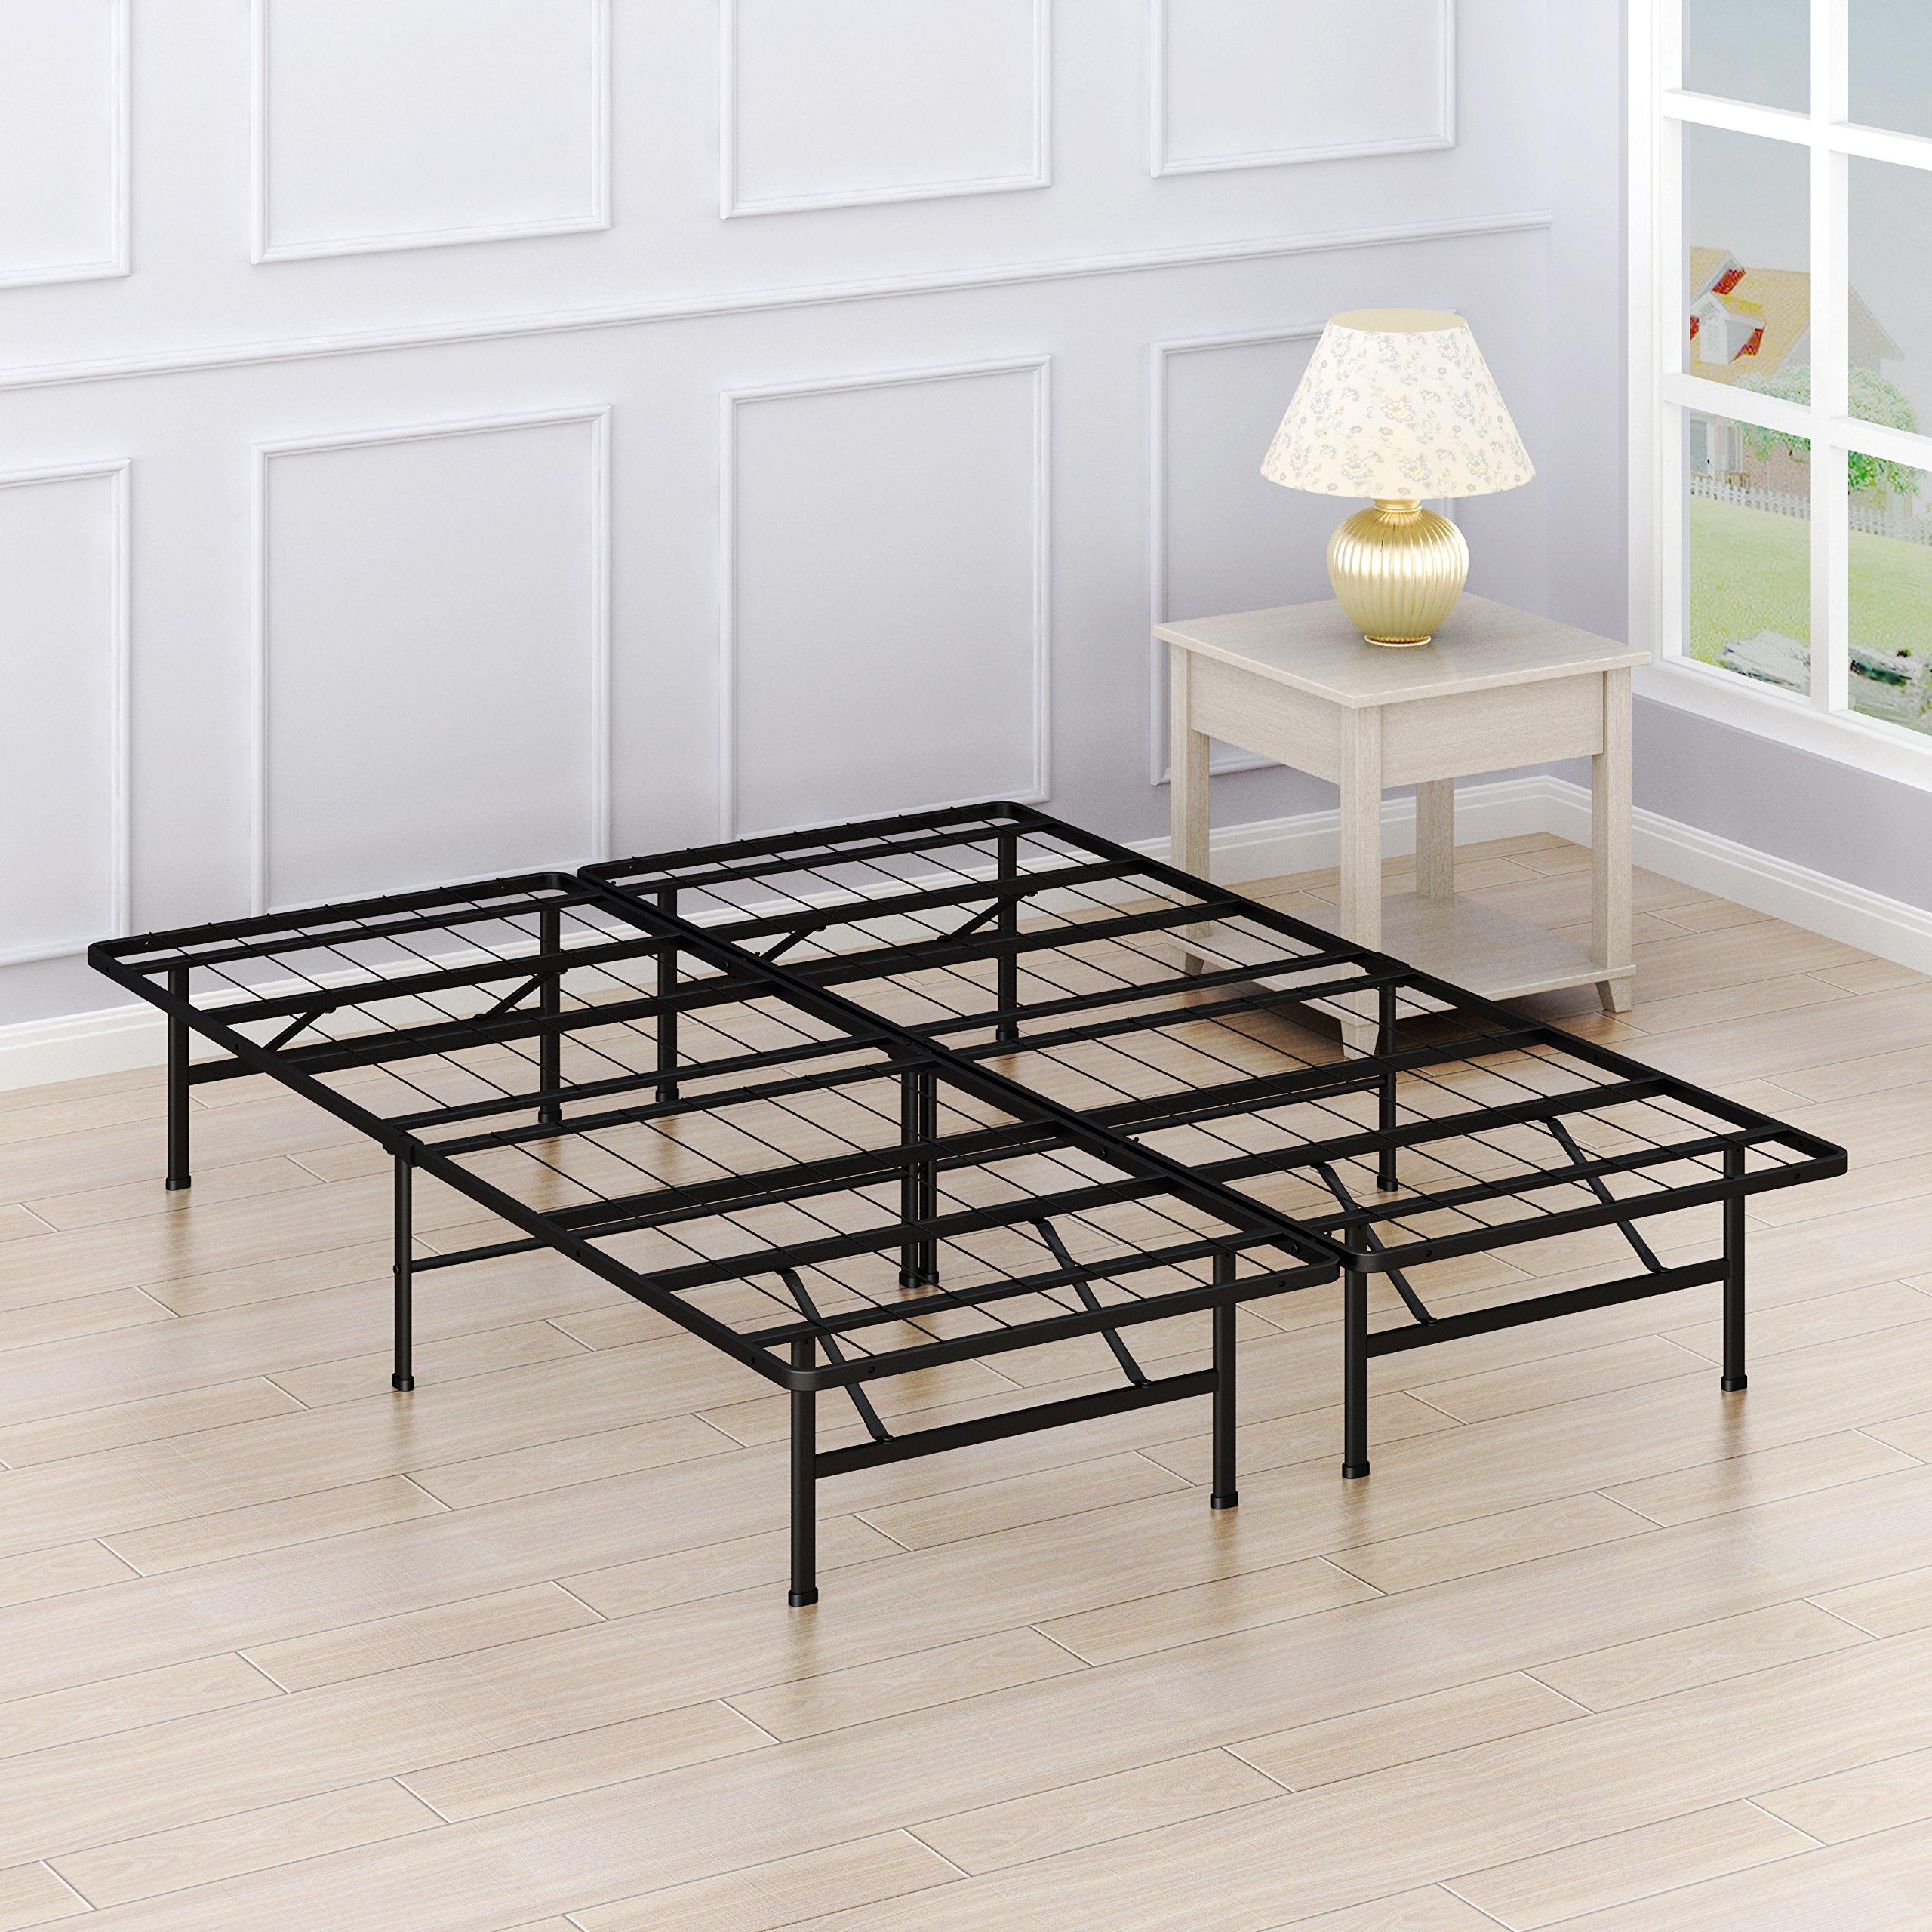 Simple Houseware 14-inch Full Size Mattress Foundation Platform Bed Frame, Full